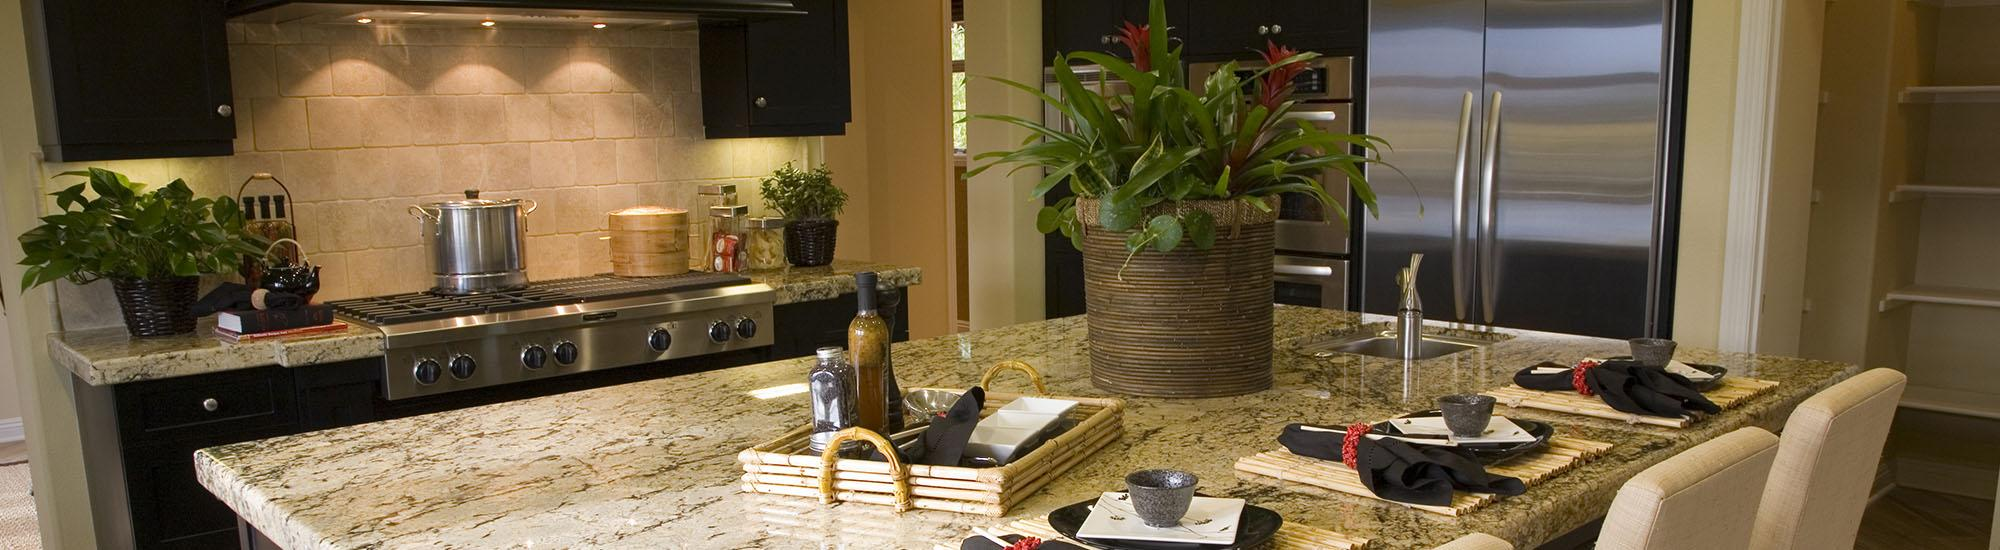 Careers woodpecker kitchen designs inc for Design consultant jobs toronto